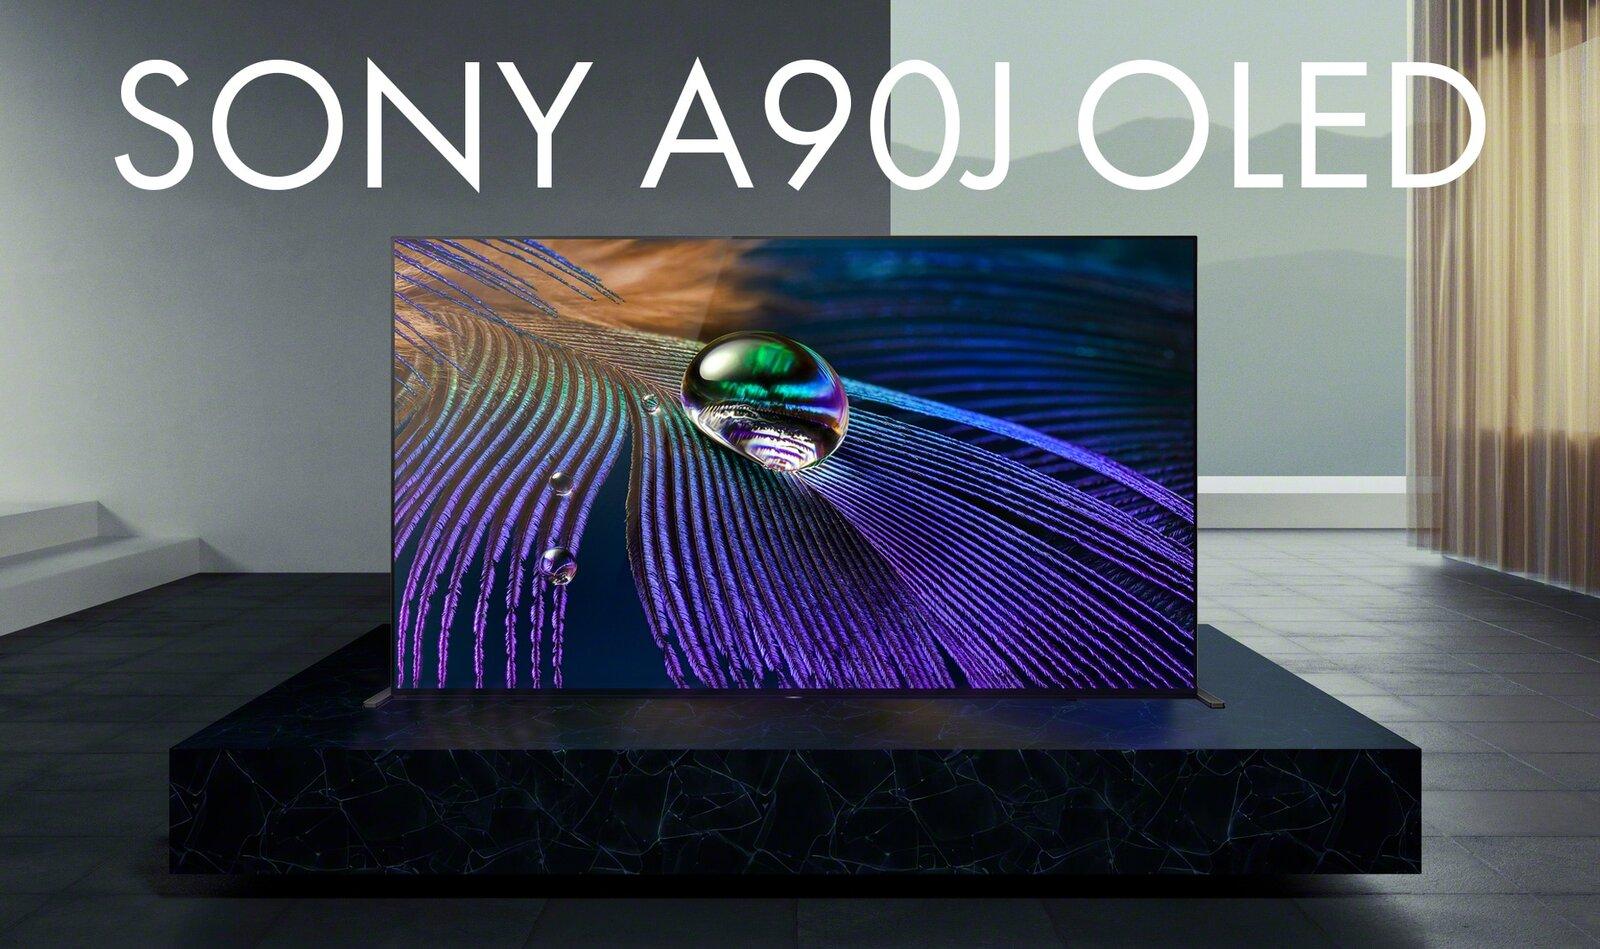 a90j-4k-oled-tv-hdmit-2-1-sony_2.jpg